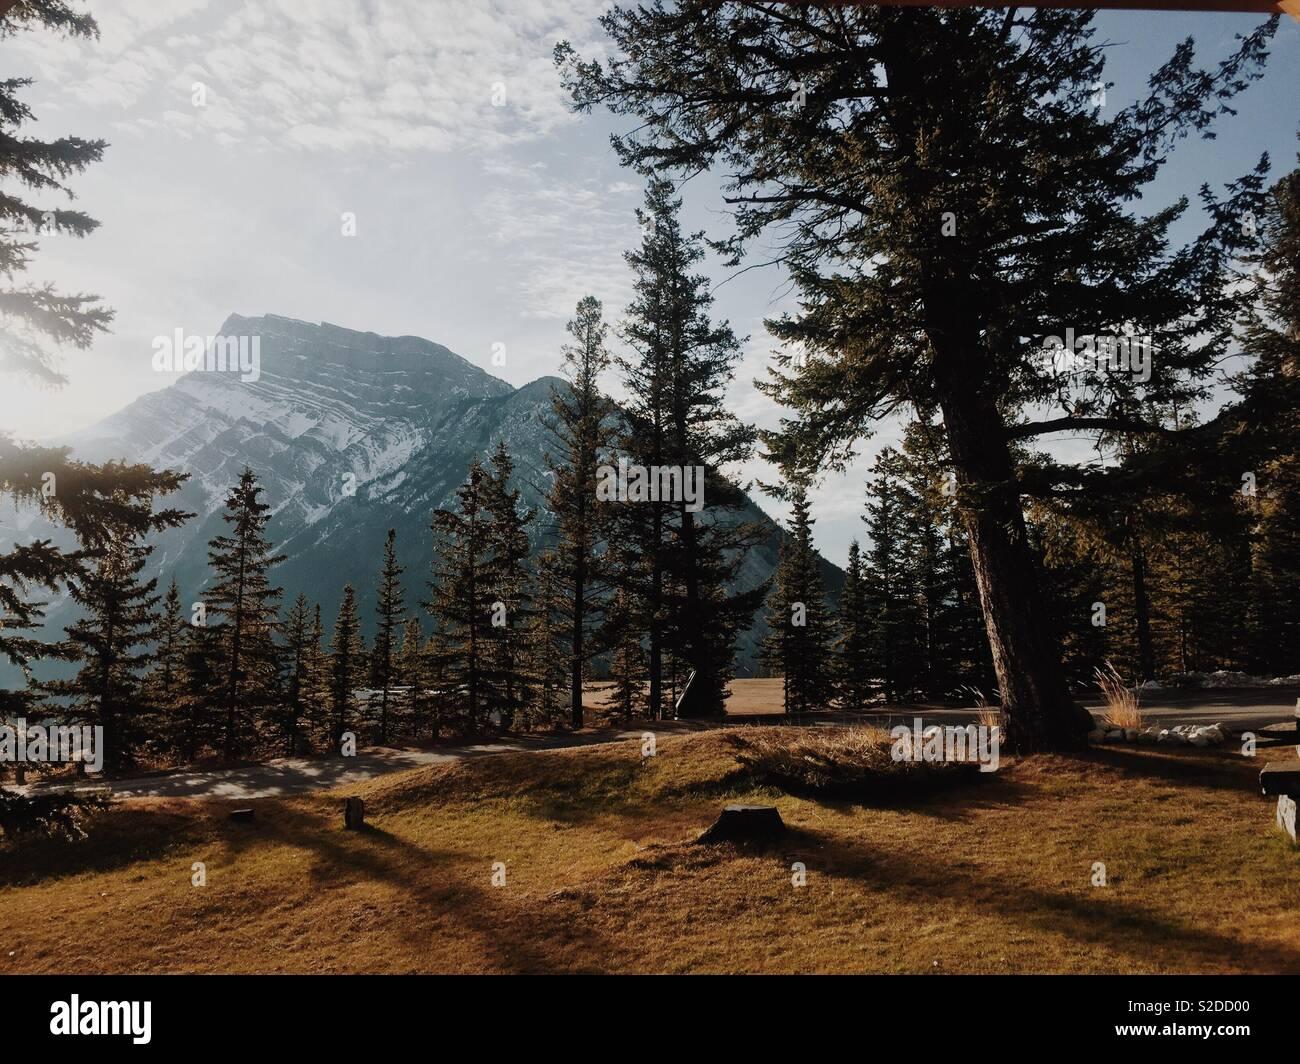 View of mountain through the trees, Banff - Stock Image